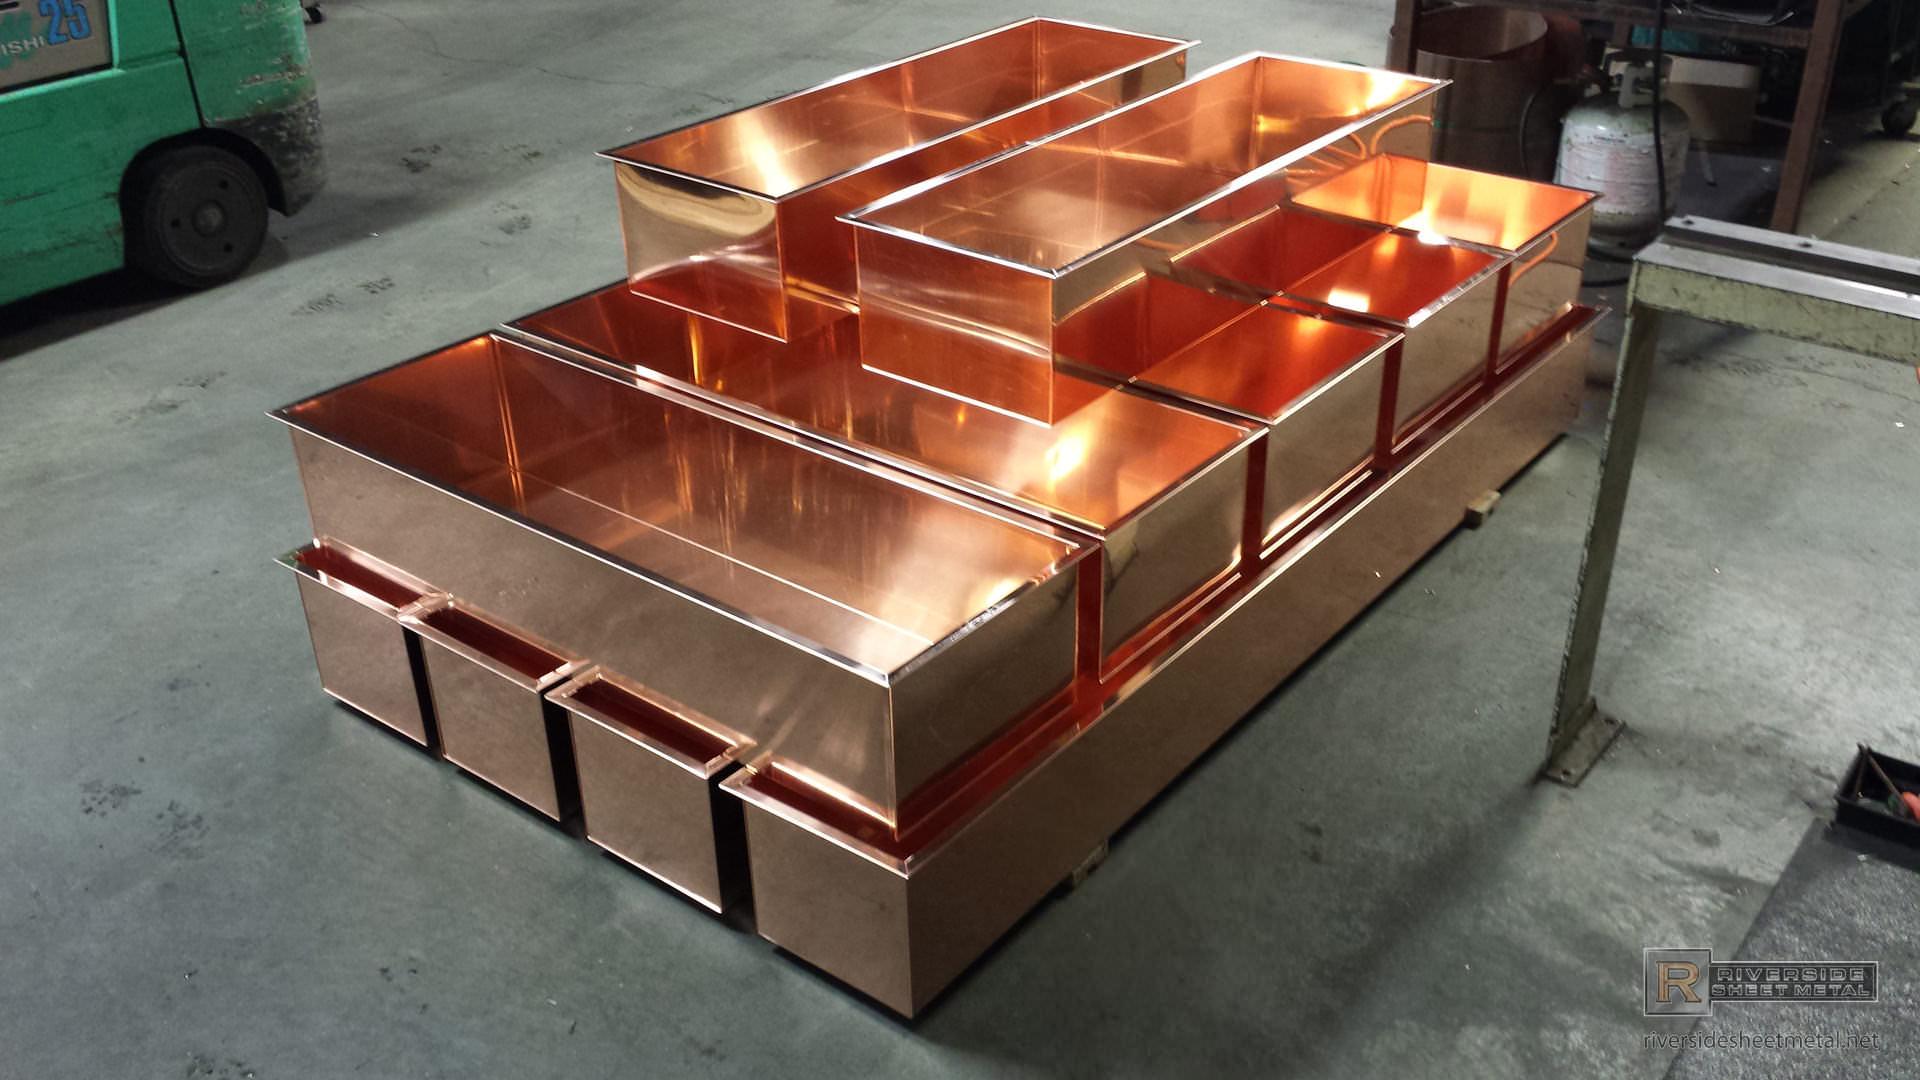 Built Custom Pans Copper